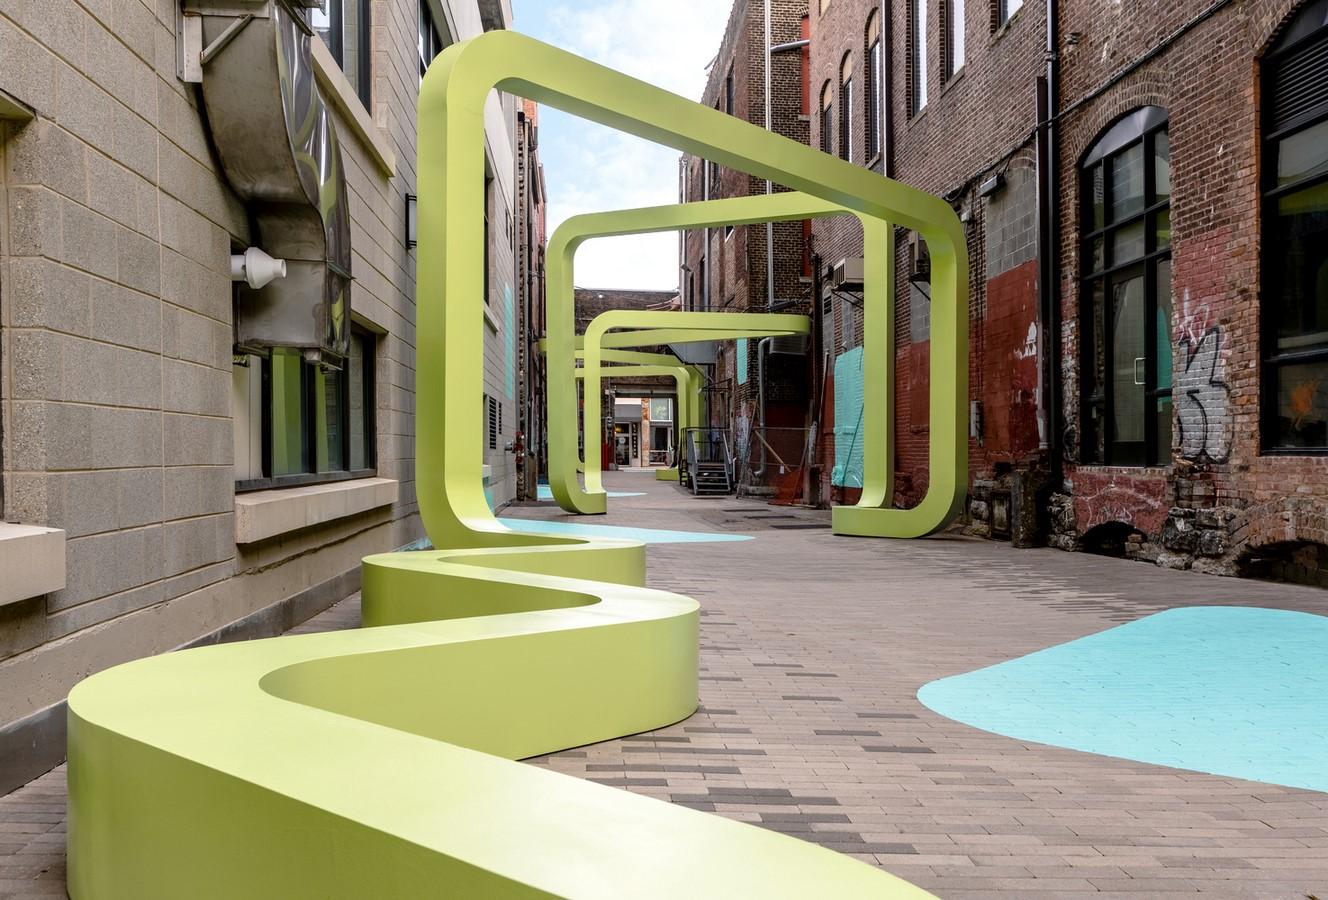 Urban regeneration through public space - Sheet7